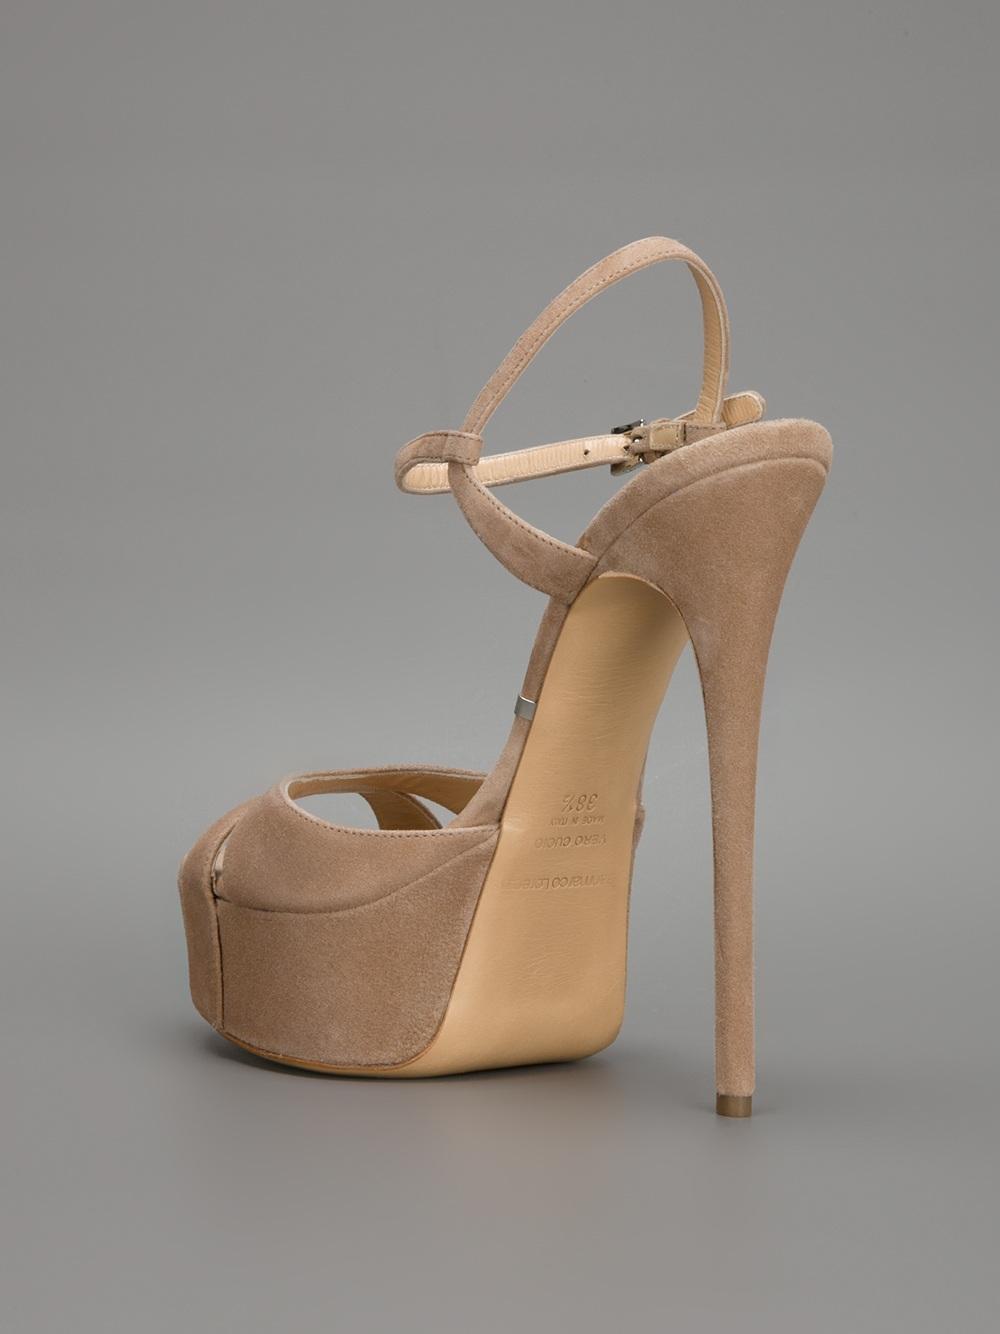 Lyst Gianmarco Lorenzi Stiletto Platform Sandal In Natural